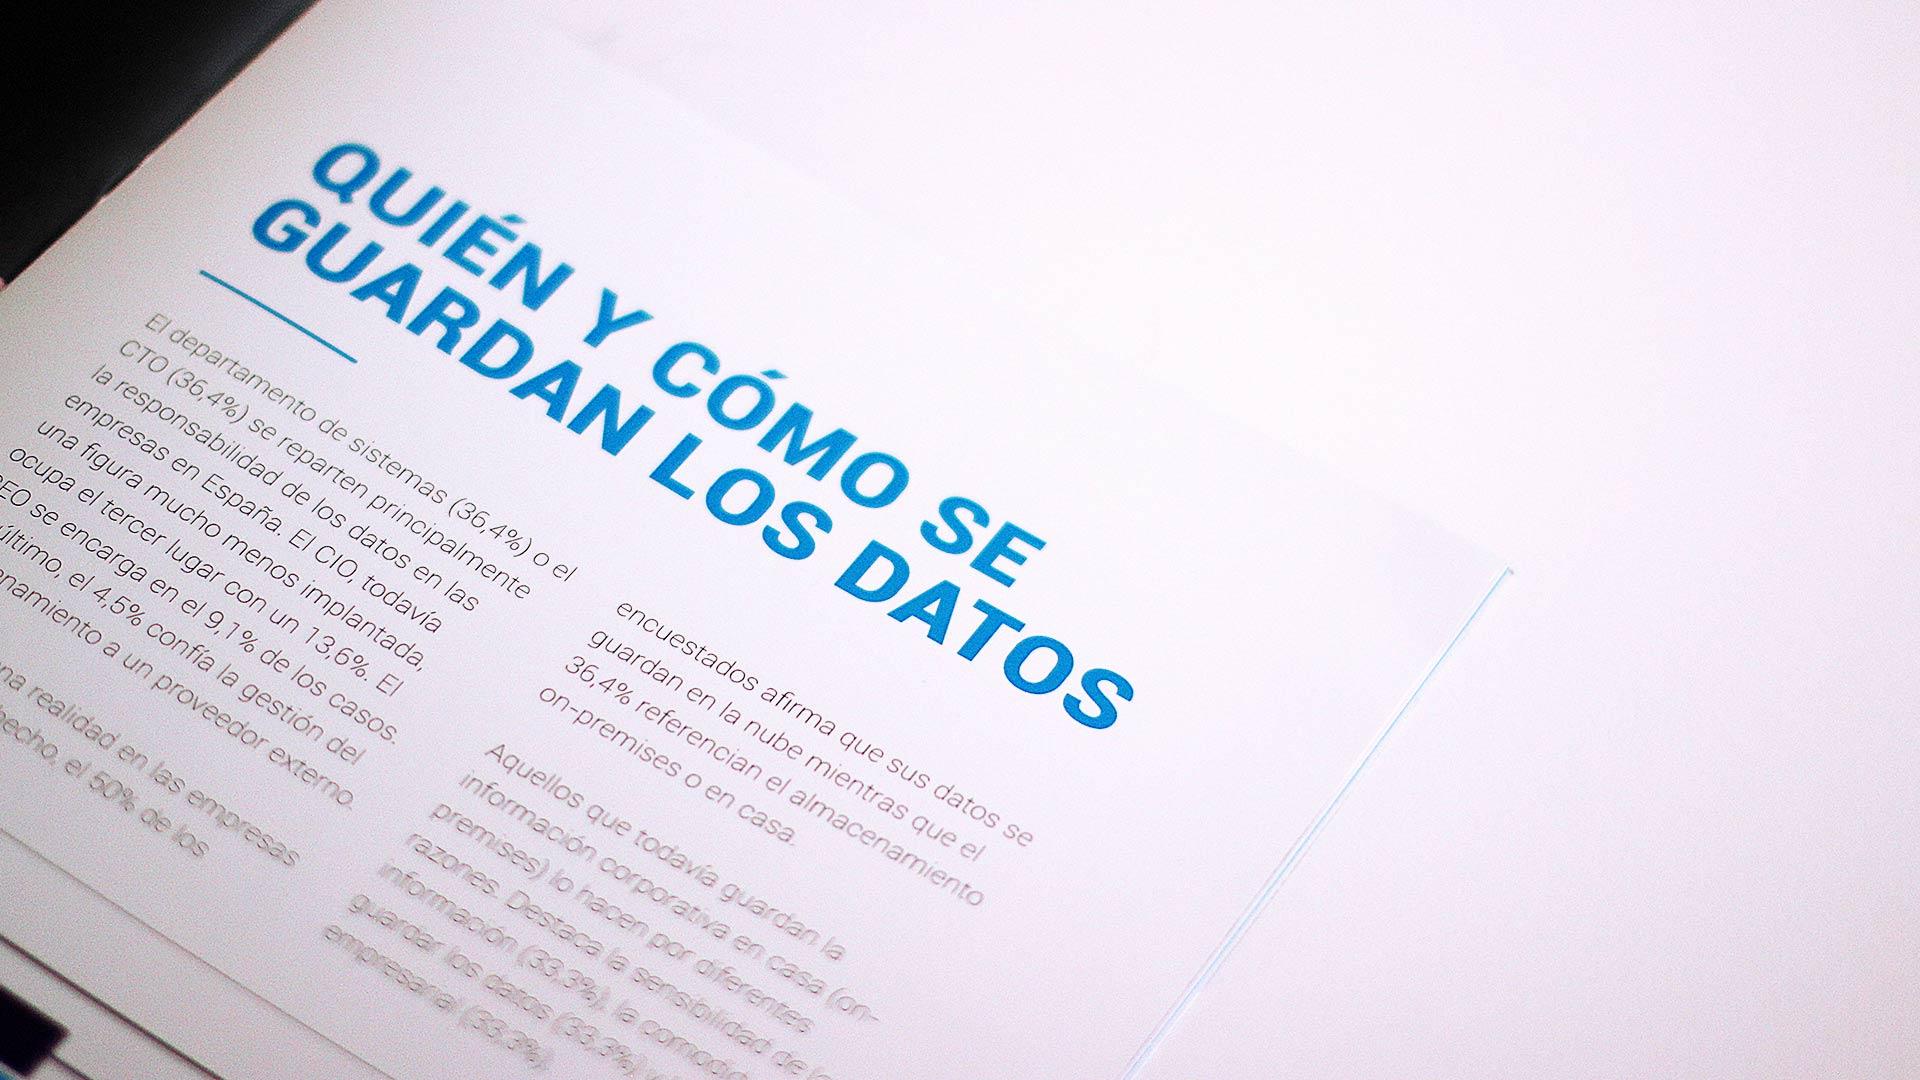 netapp-mediacloud-content-marketing-informe-resumen-ejecutivo-ebook-2017-13